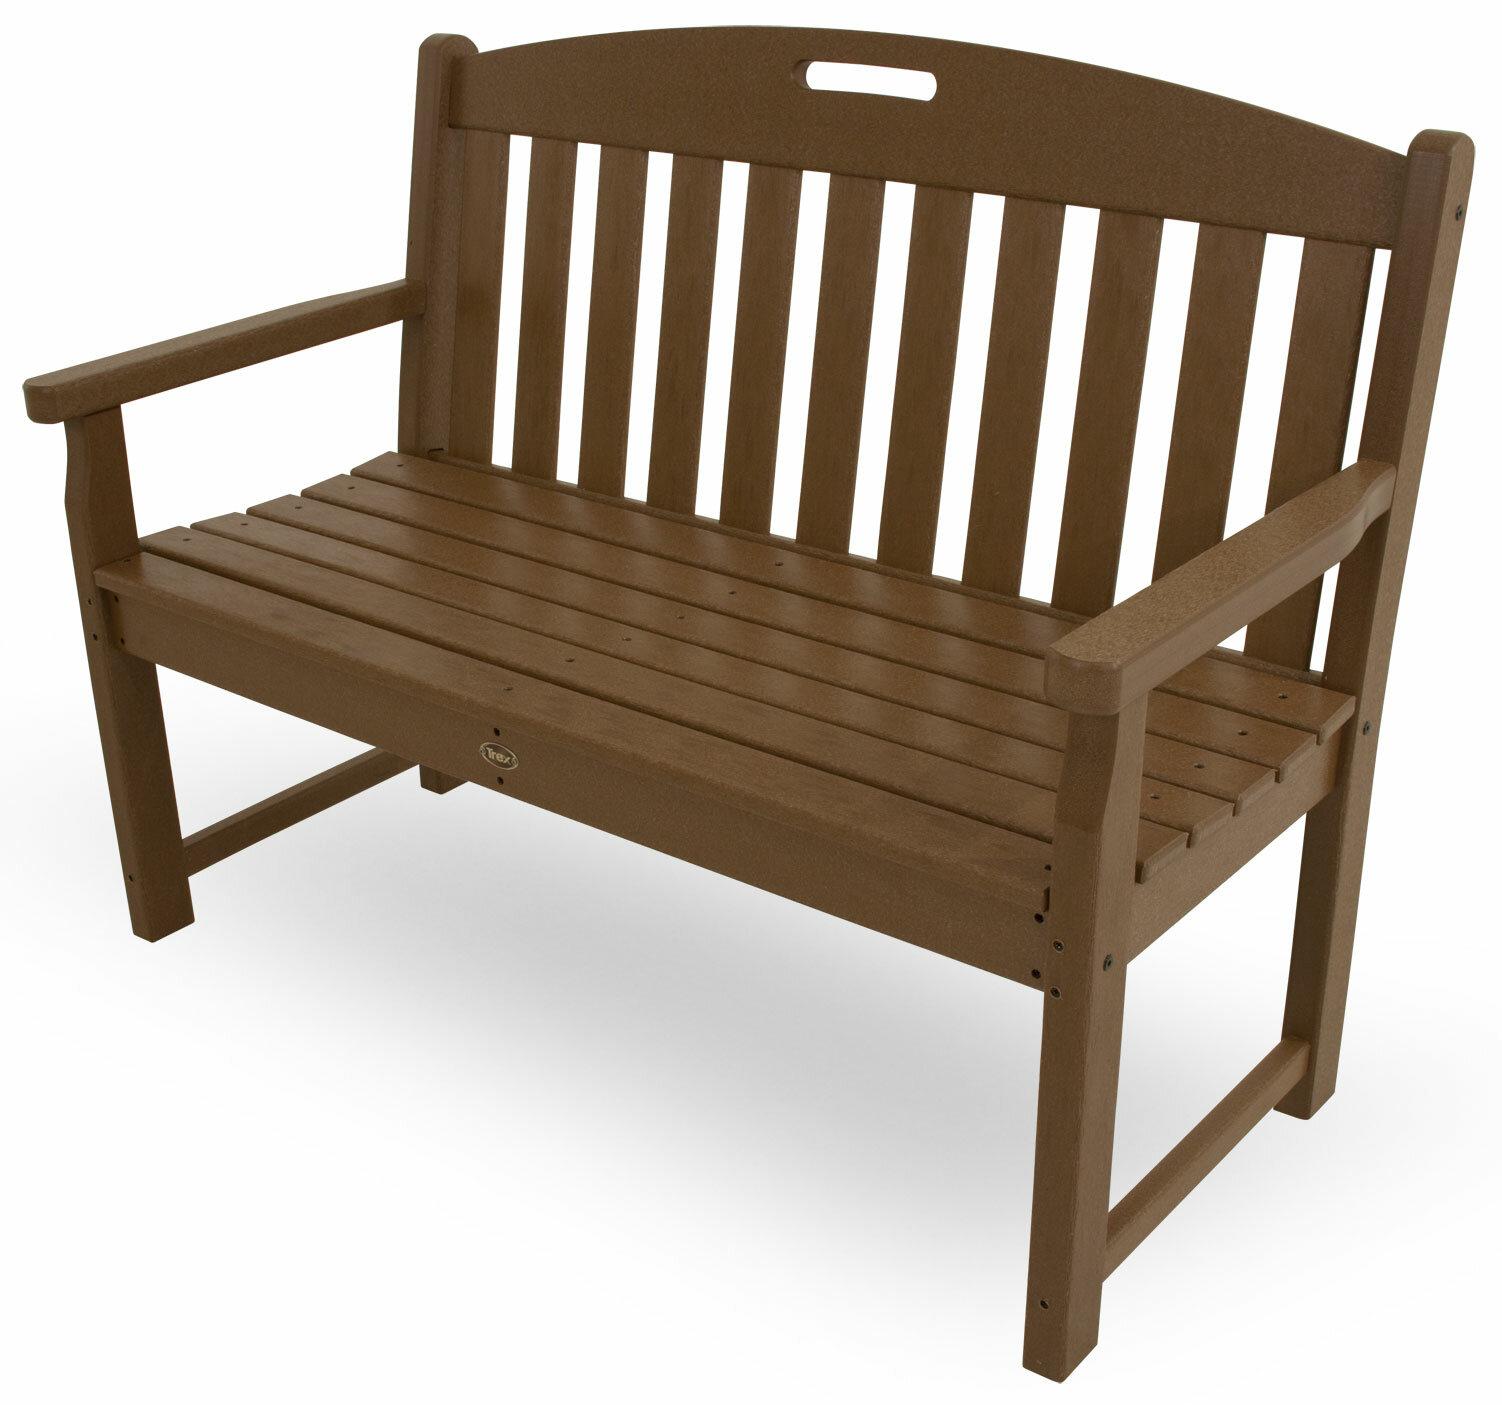 Trex yacht club plastic garden bench reviews wayfair